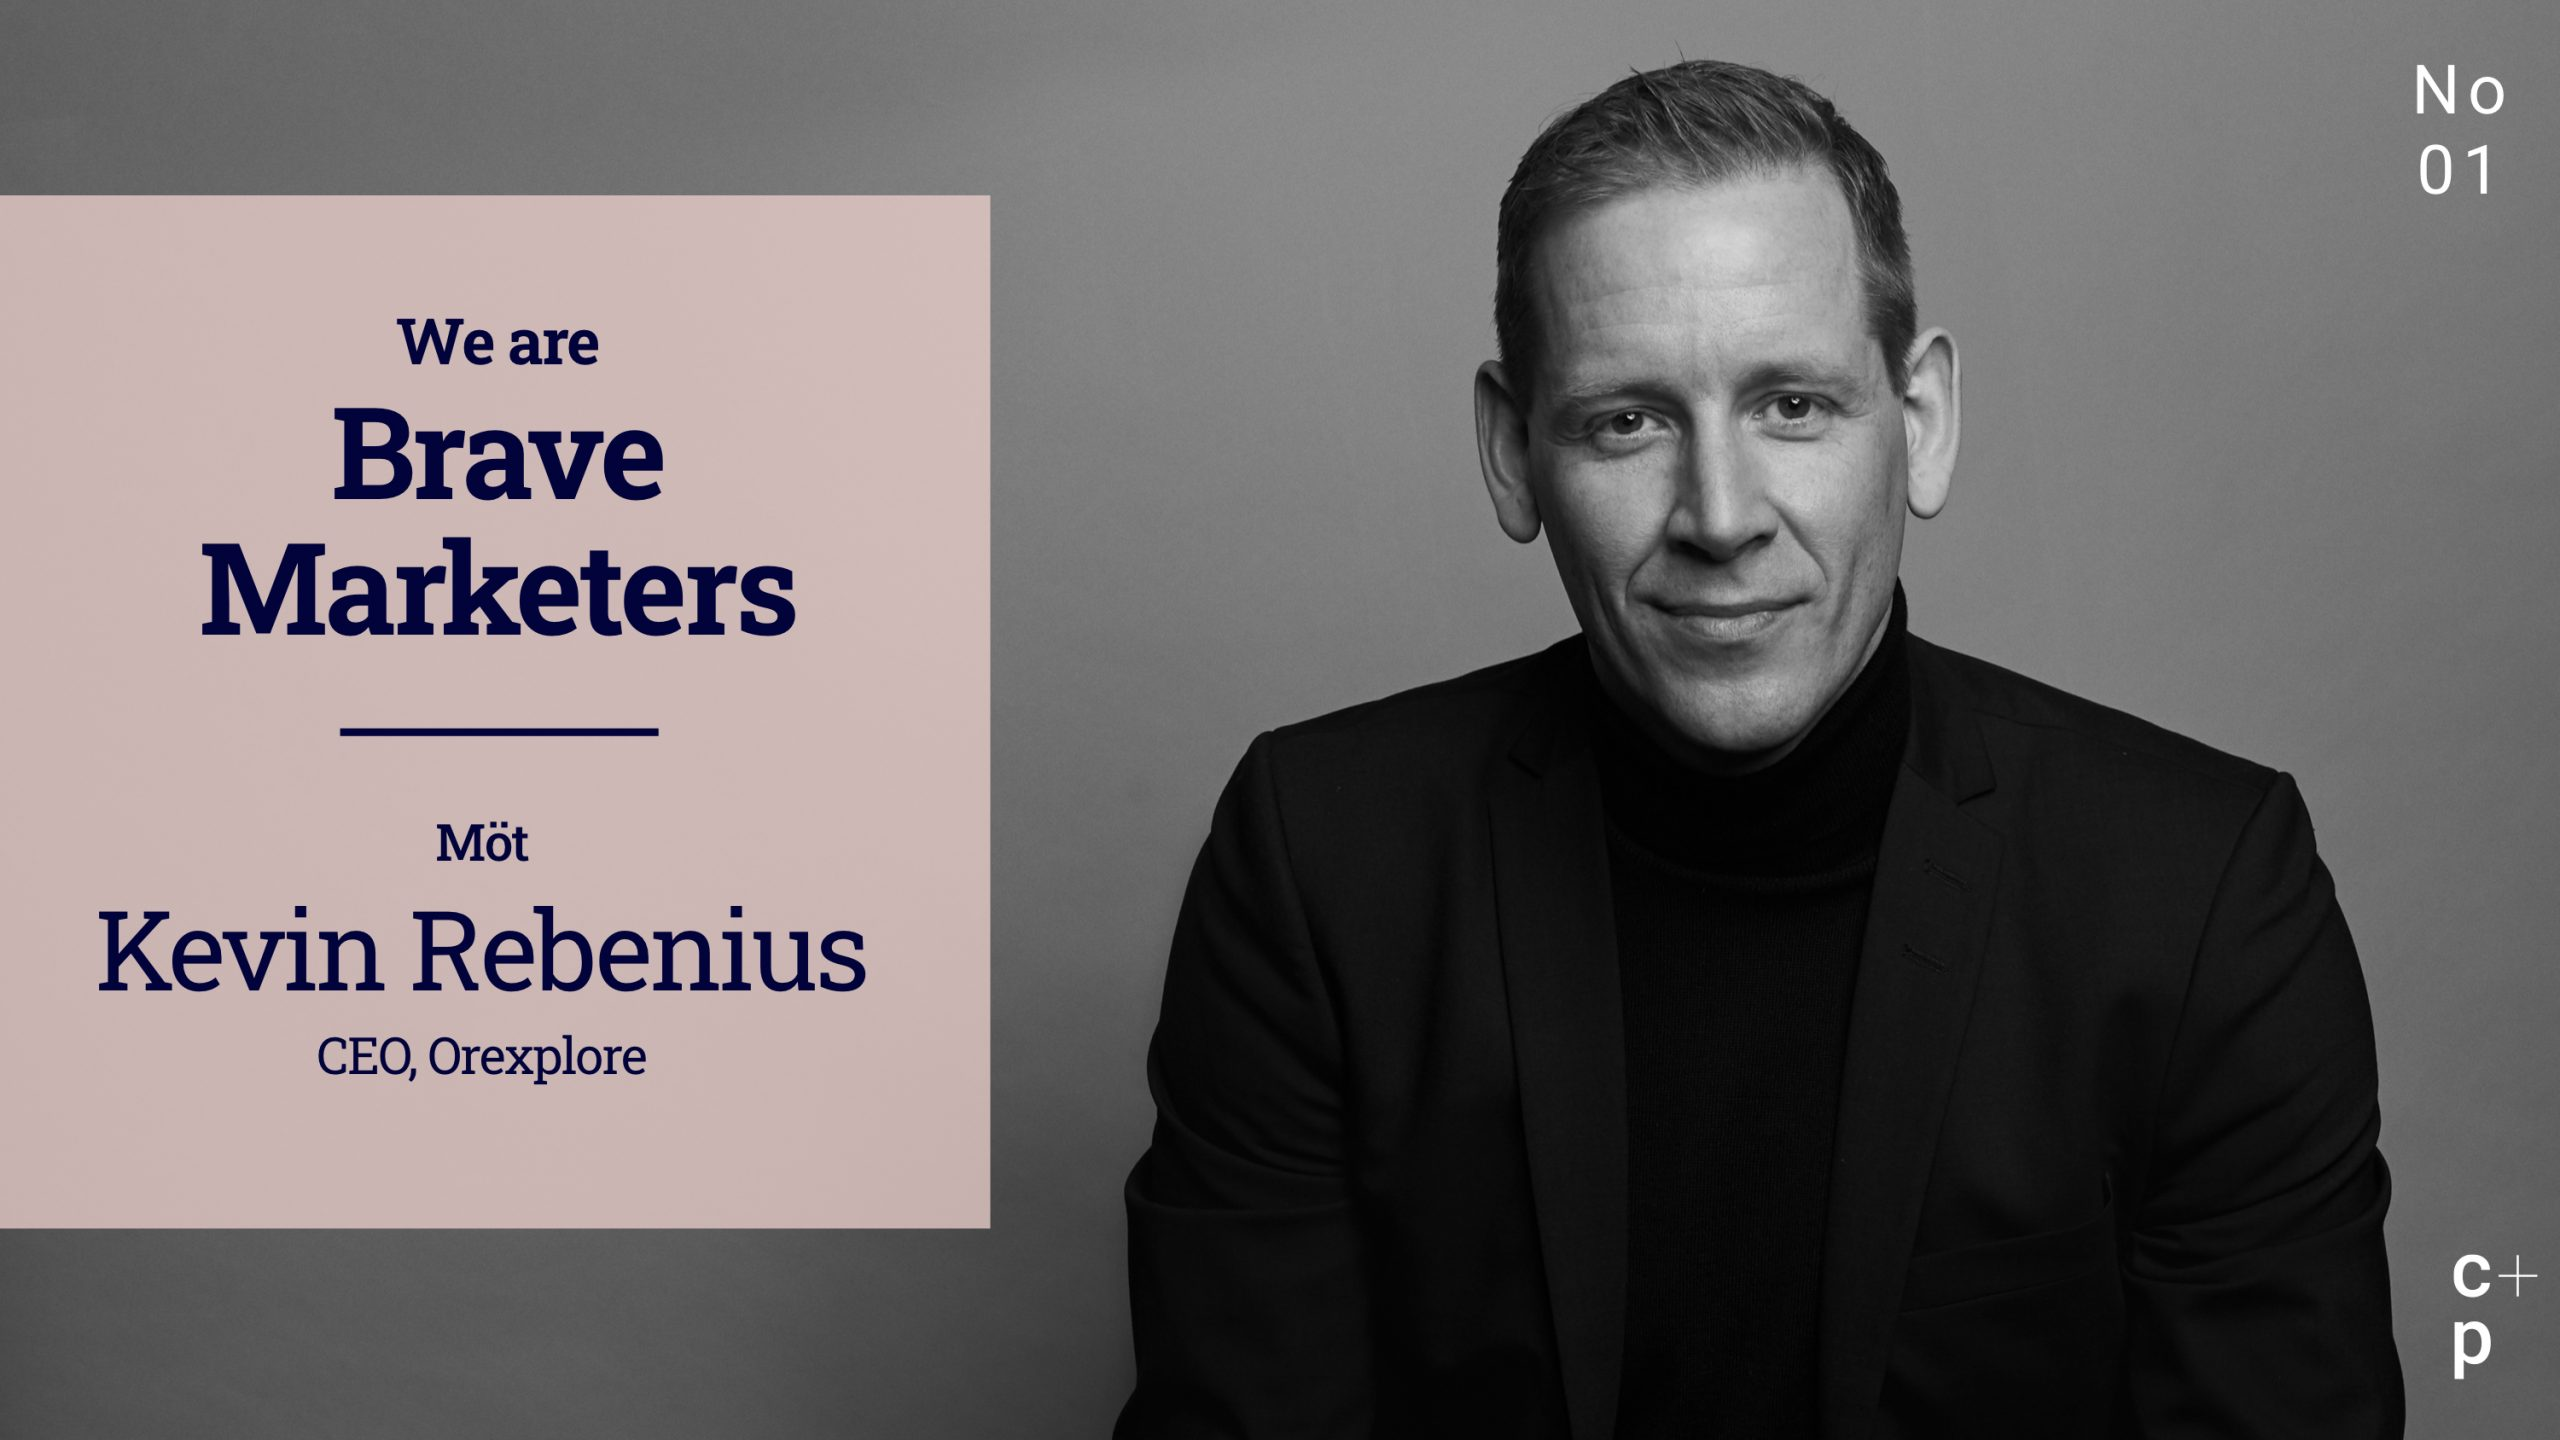 We are Brave Marketers - Kevin Rebenius